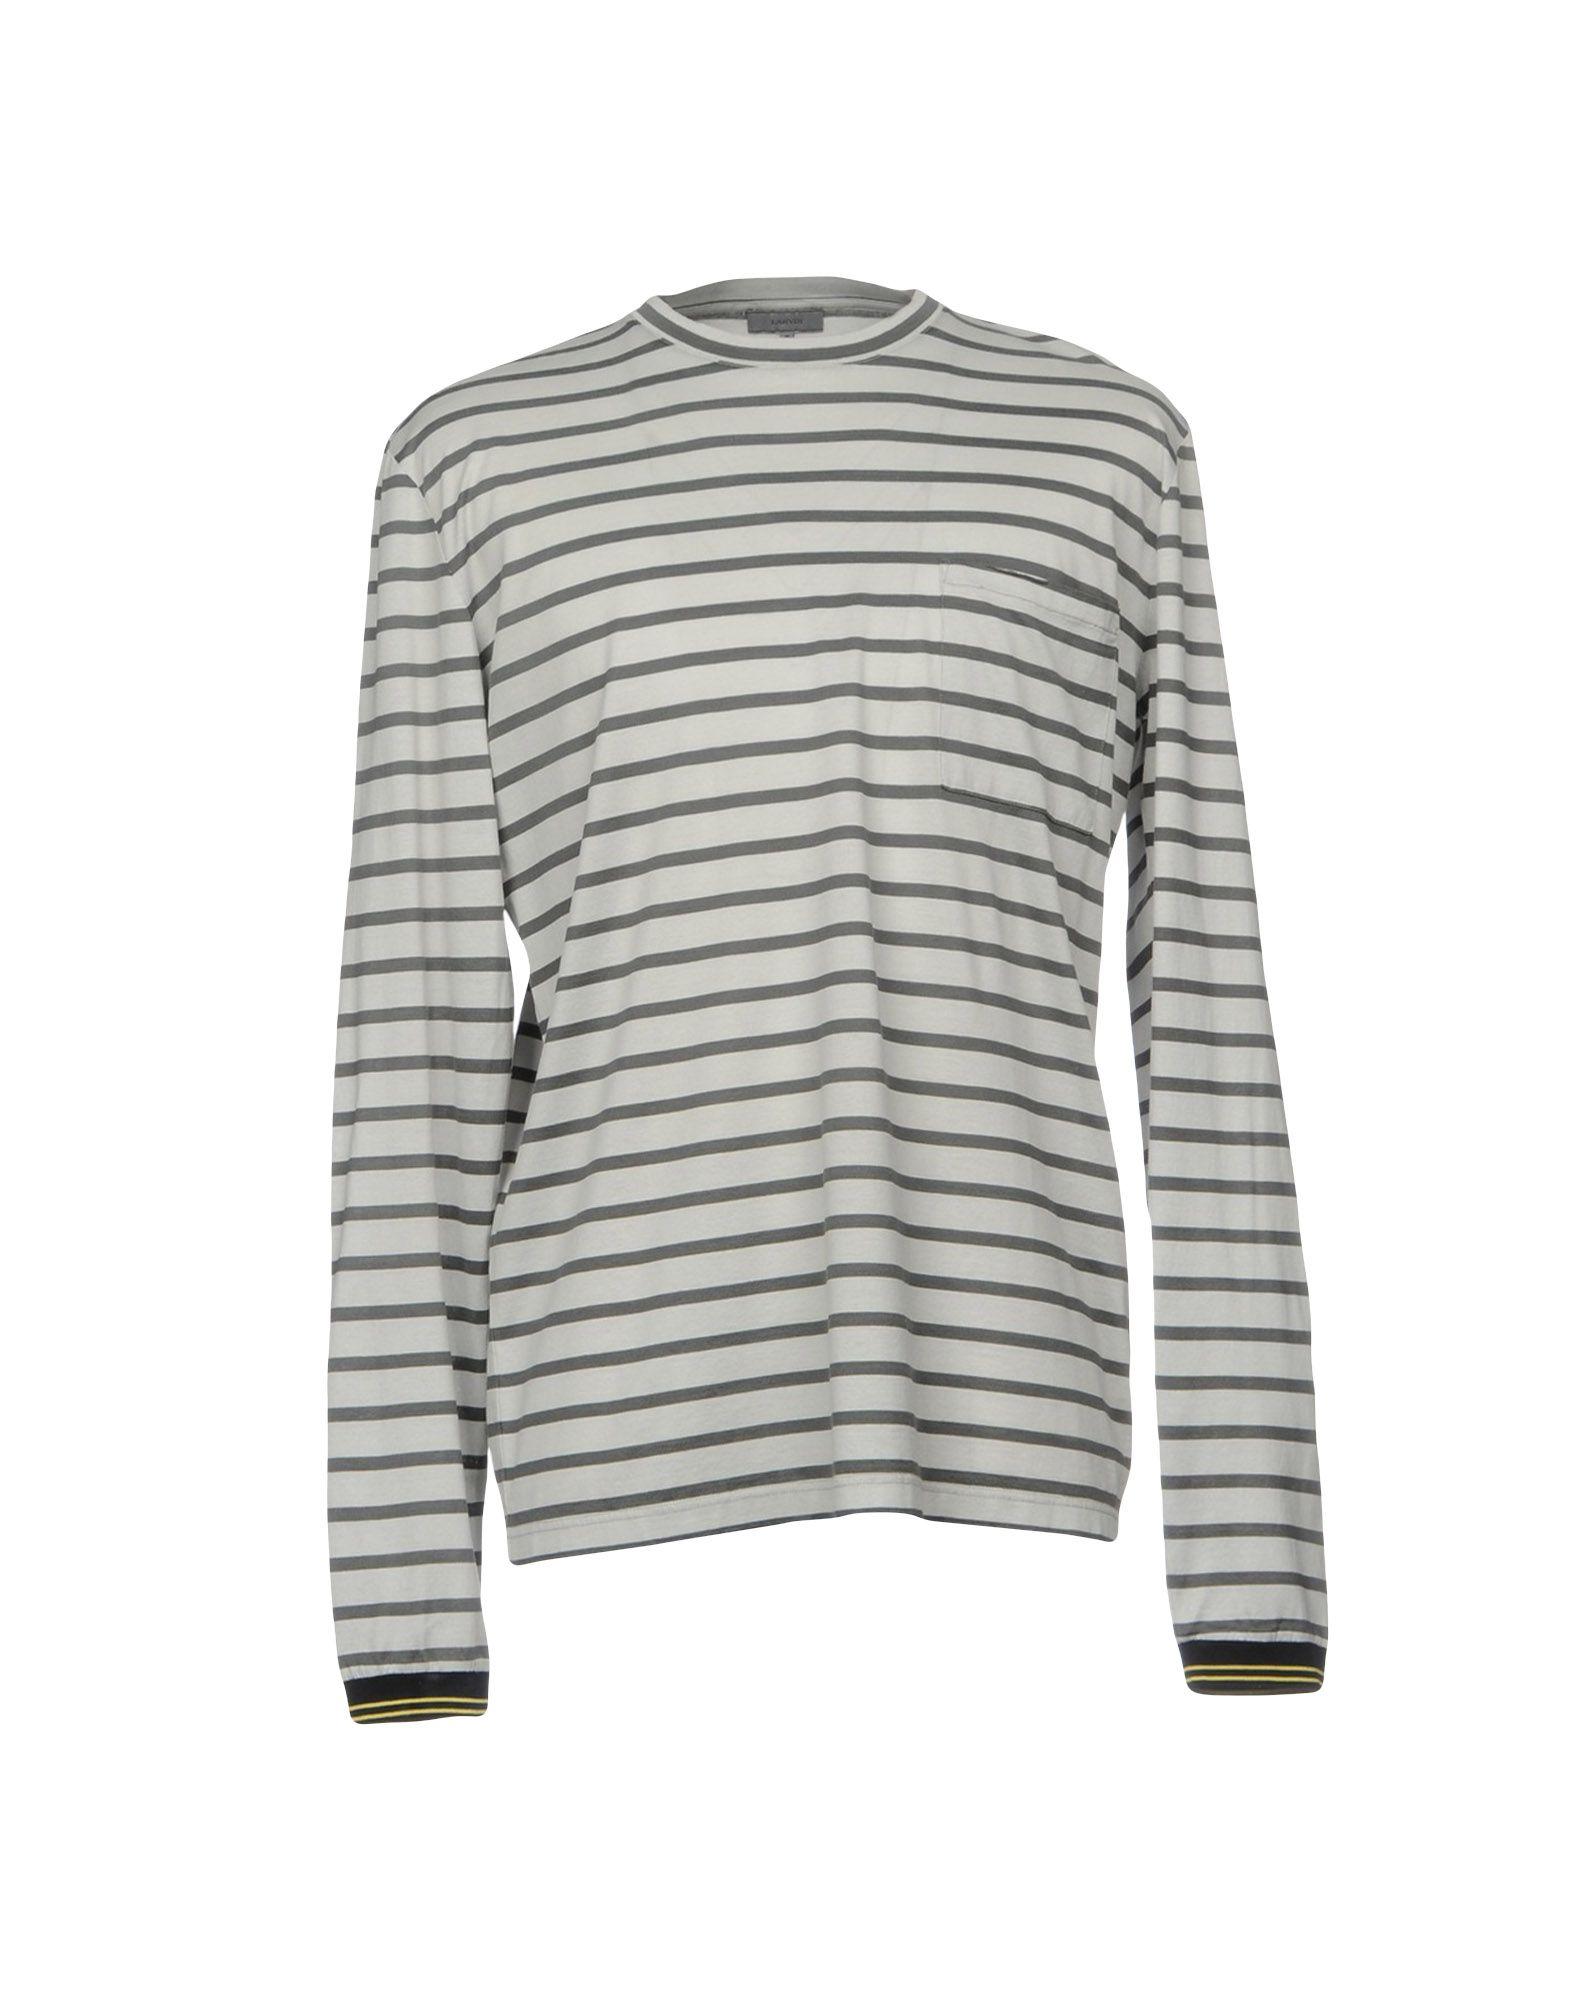 T-Shirt Lanvin Uomo - Acquista online su